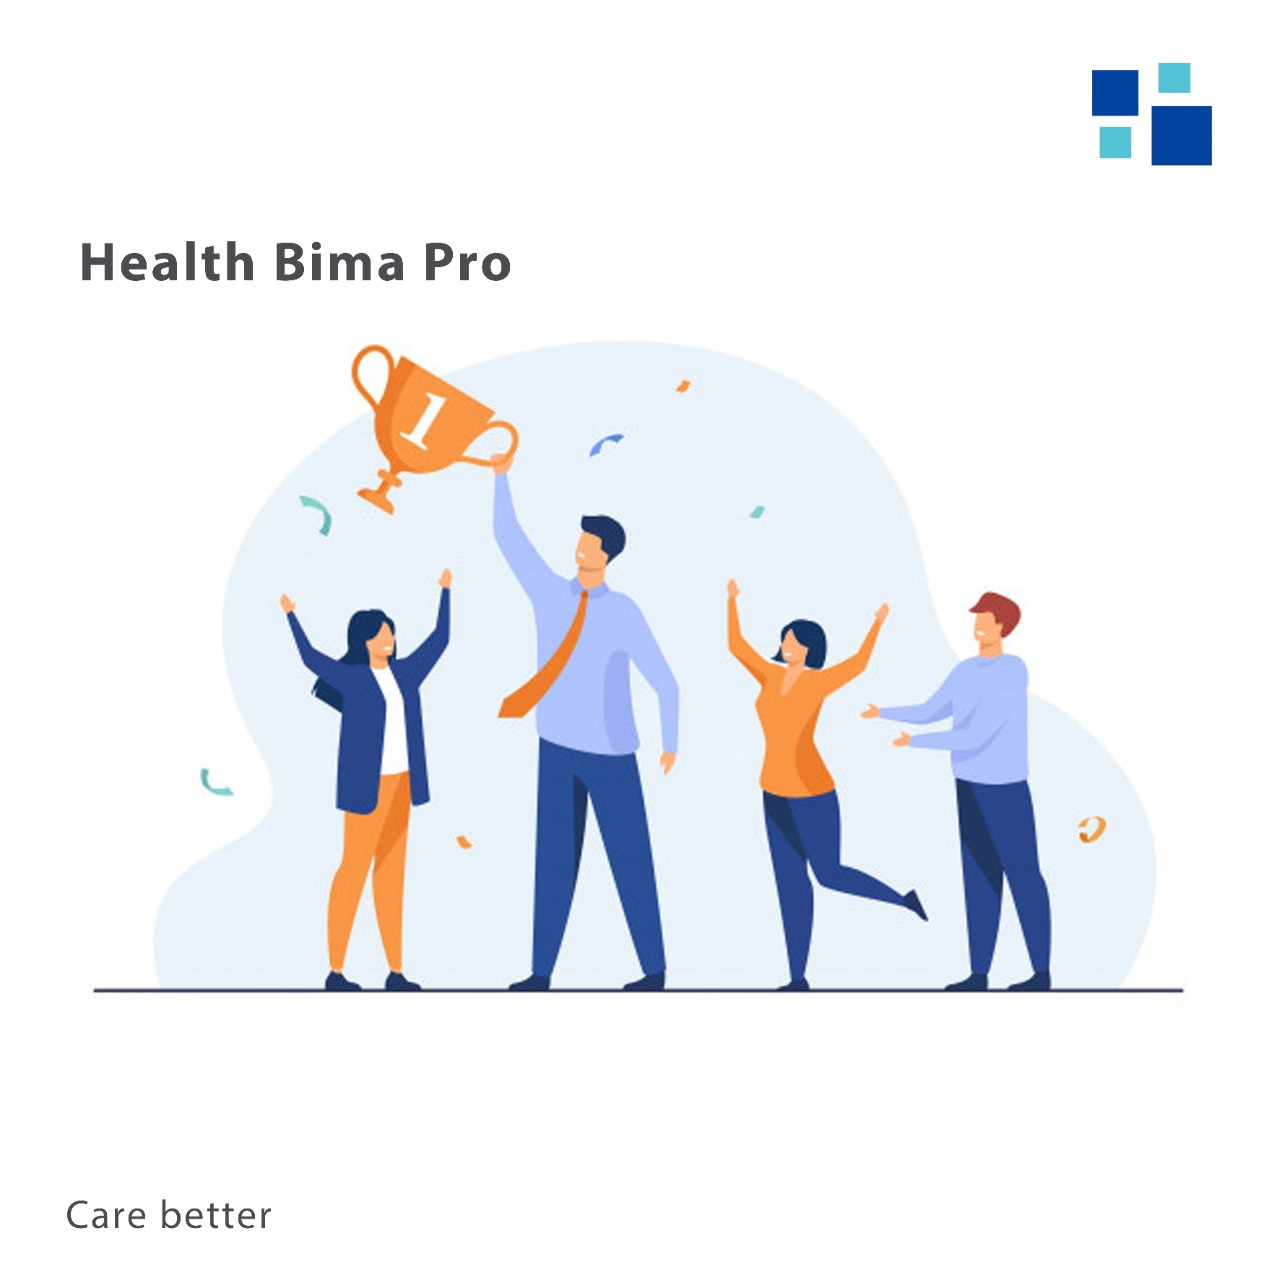 health bima pro